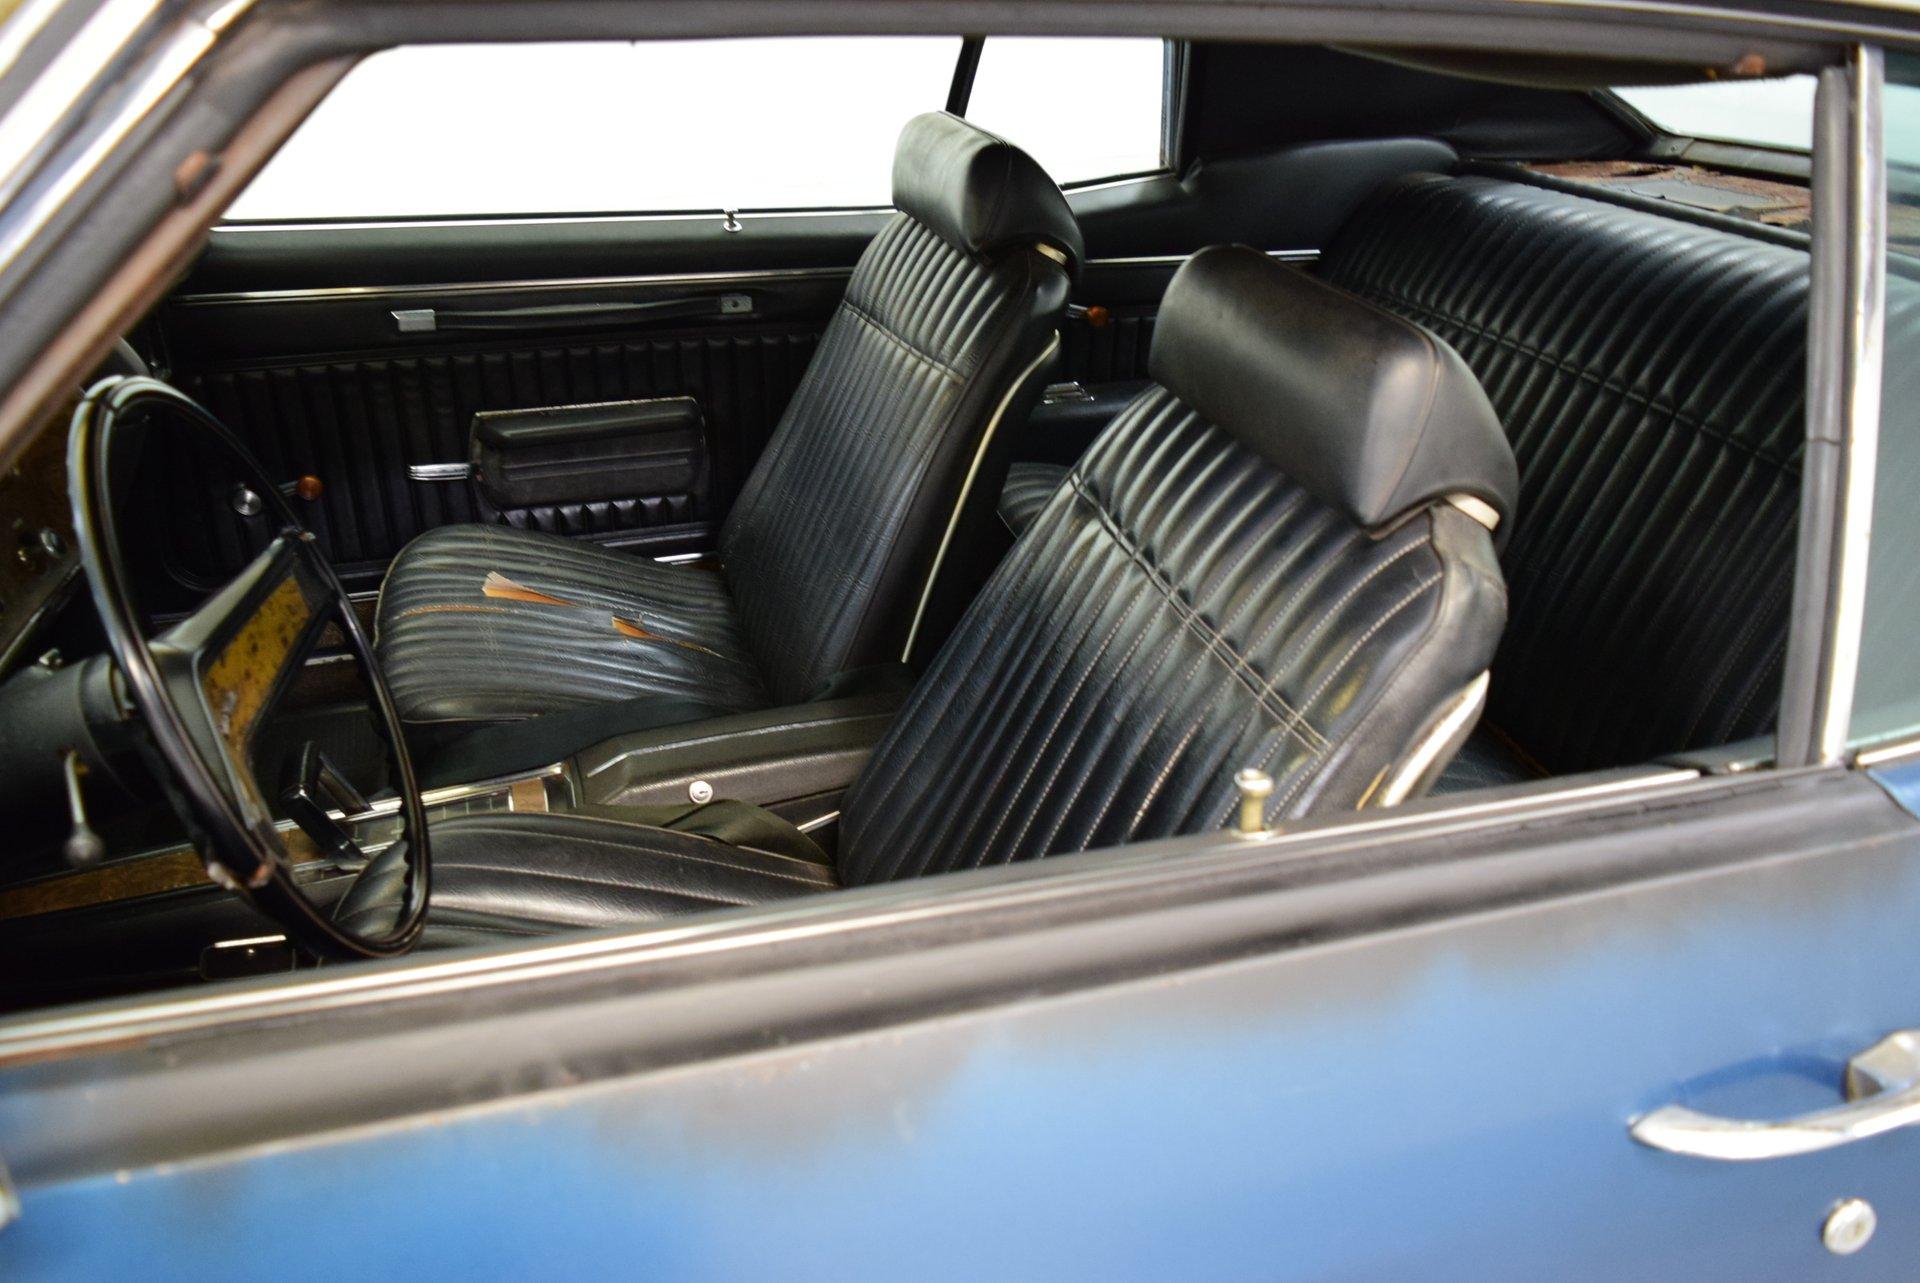 1970 Chevrolet Monte Carlo | Shelton Classics & Performance